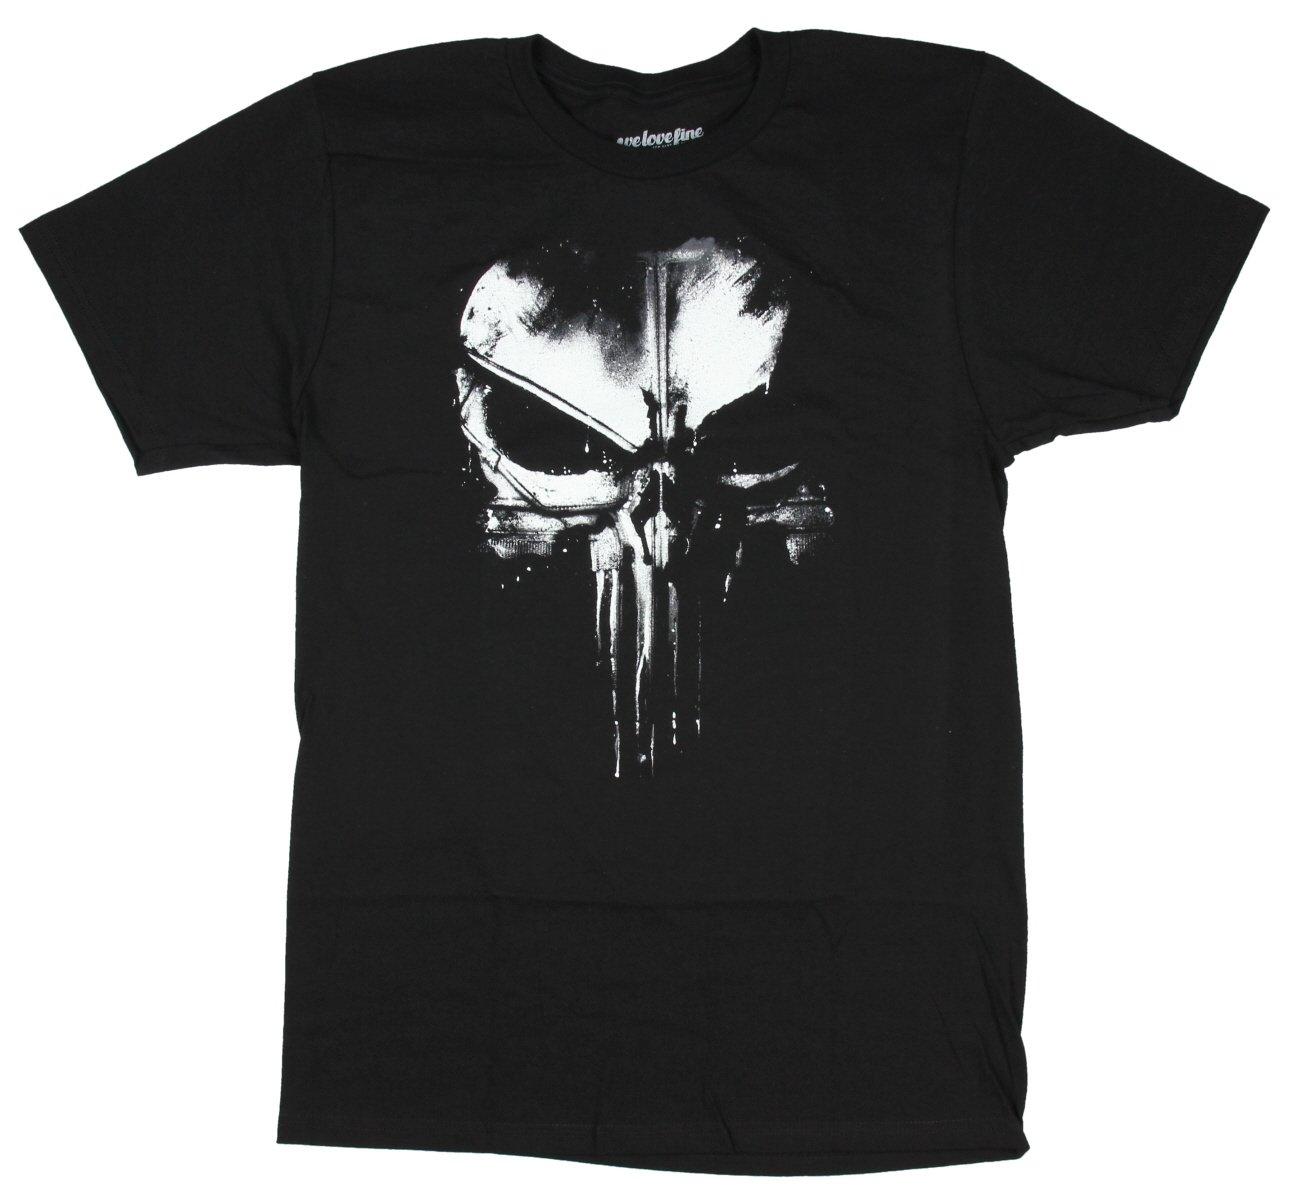 Marvel The Punisher Dirty Skull T-Shirt (Extra Large, Black) by Marvel (Image #1)